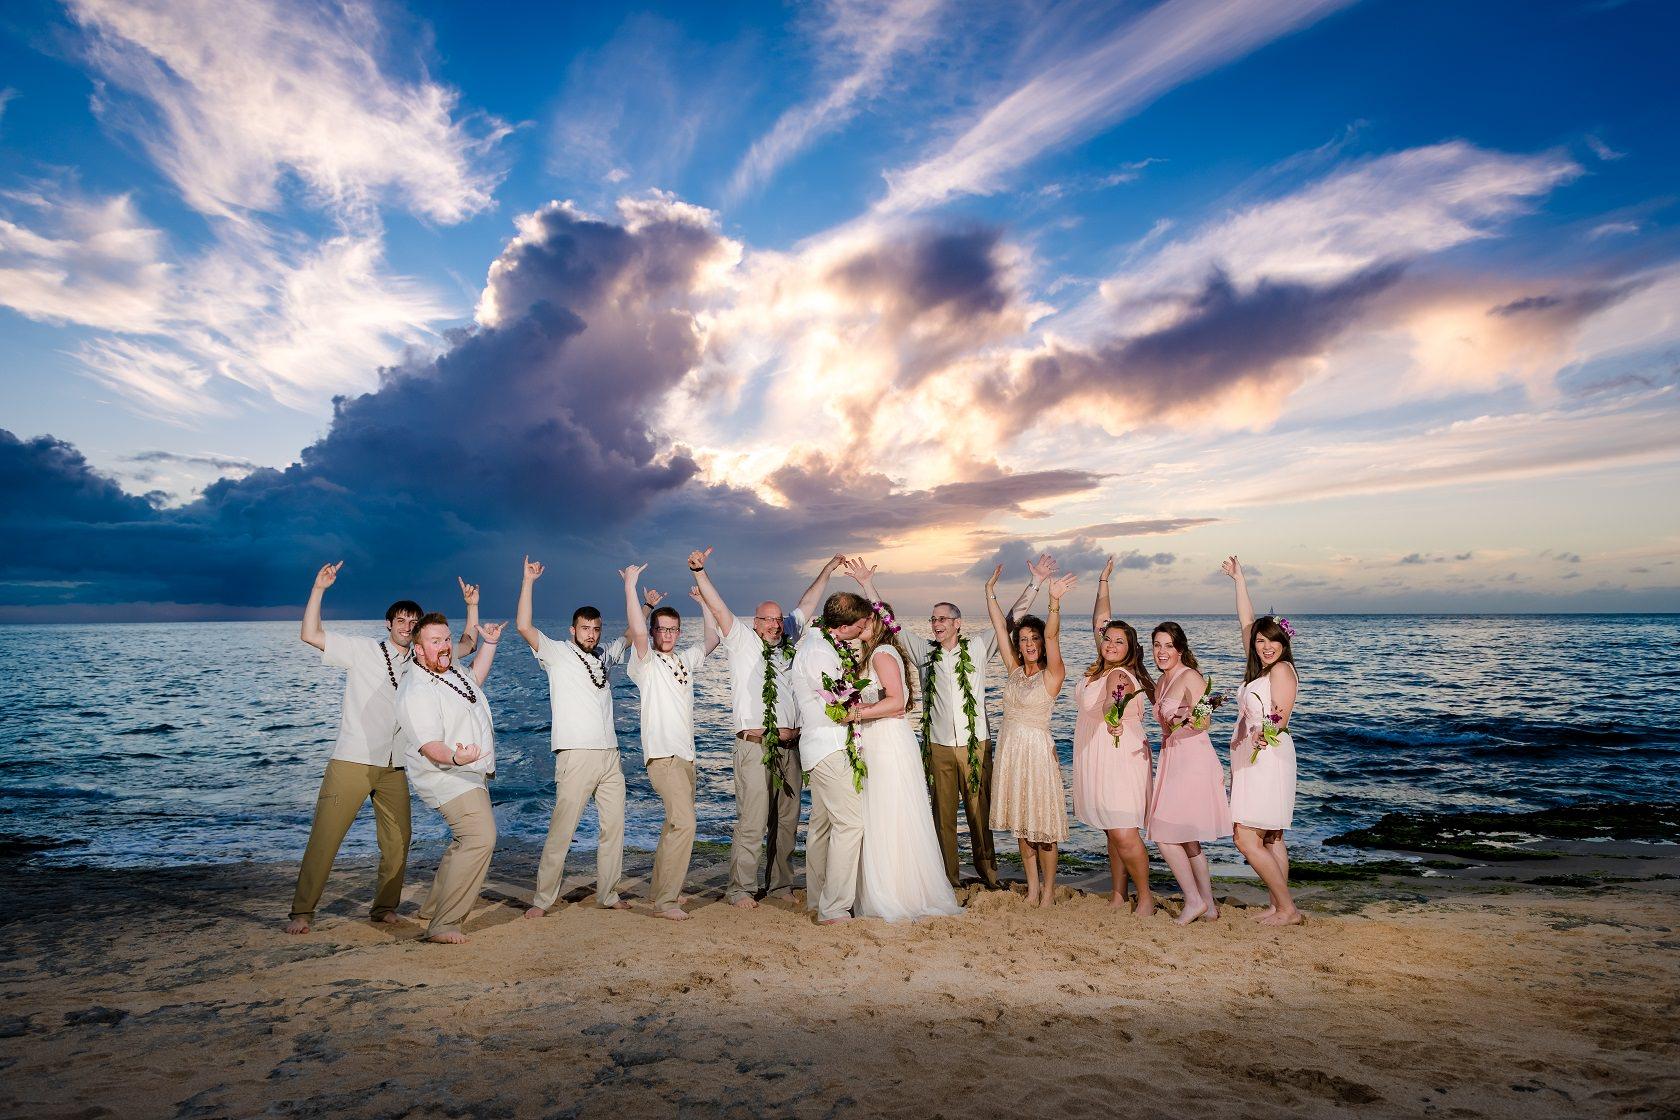 wedding party celebration beach sunset oahu hawaii